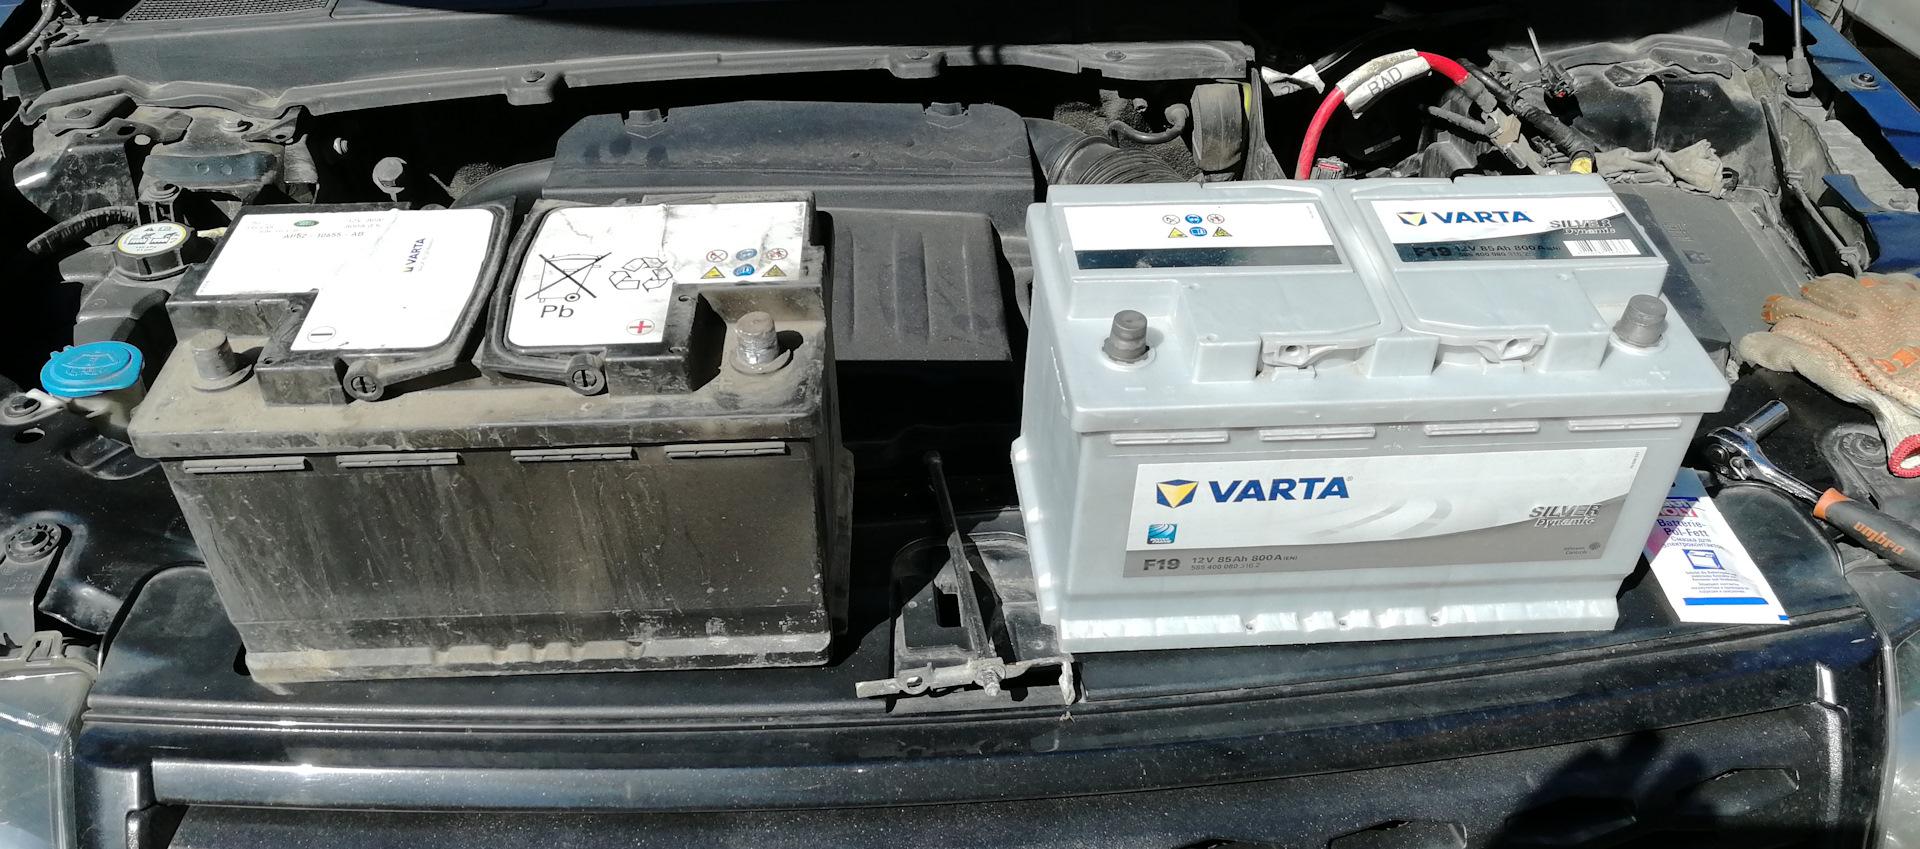 WET и обычные аккумуляторы